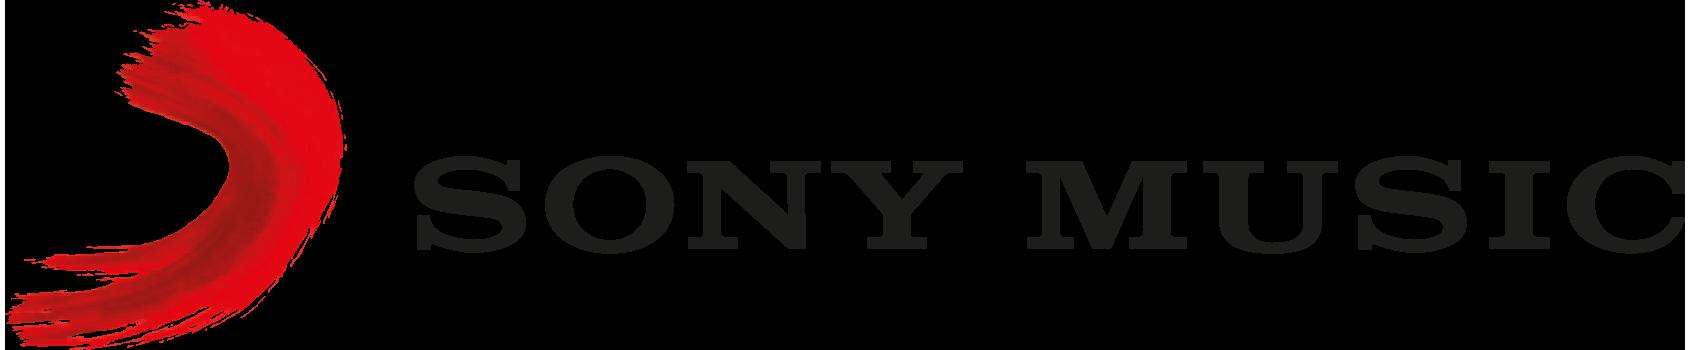 Logo - Sony Music Entertainment